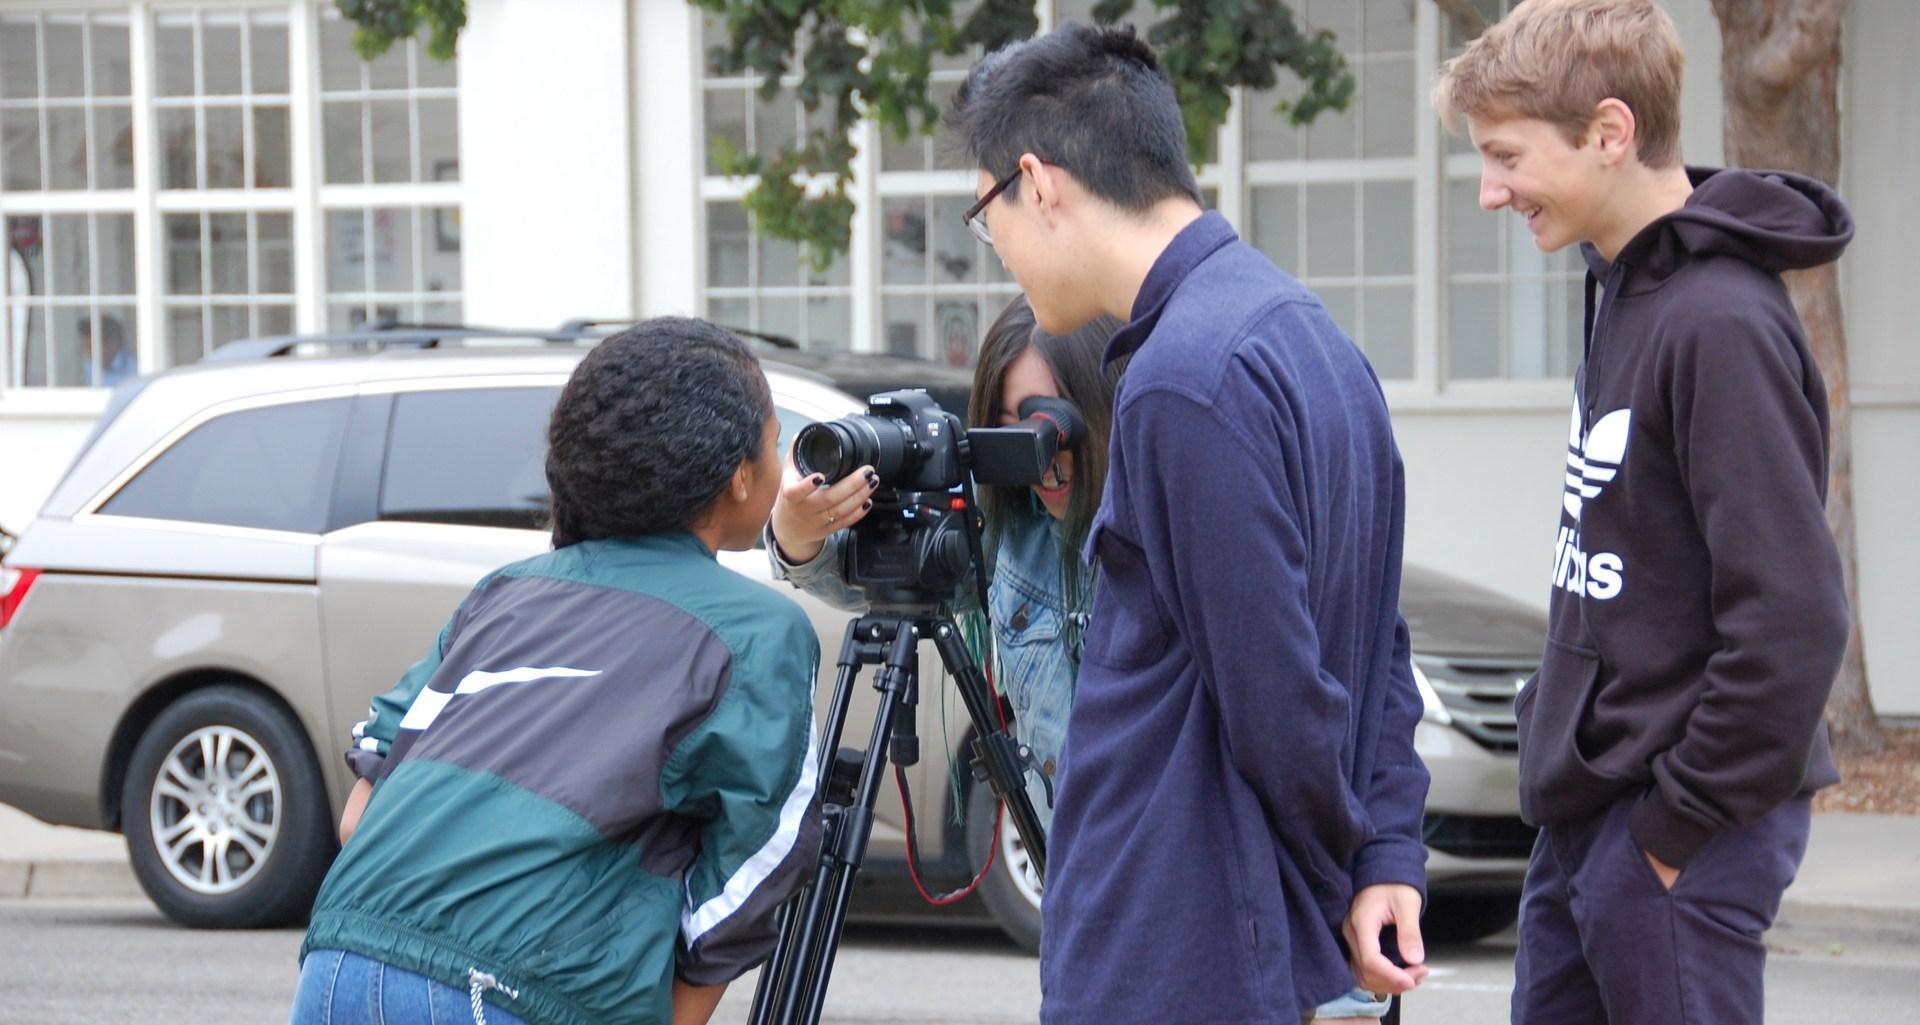 Digital Imaging students